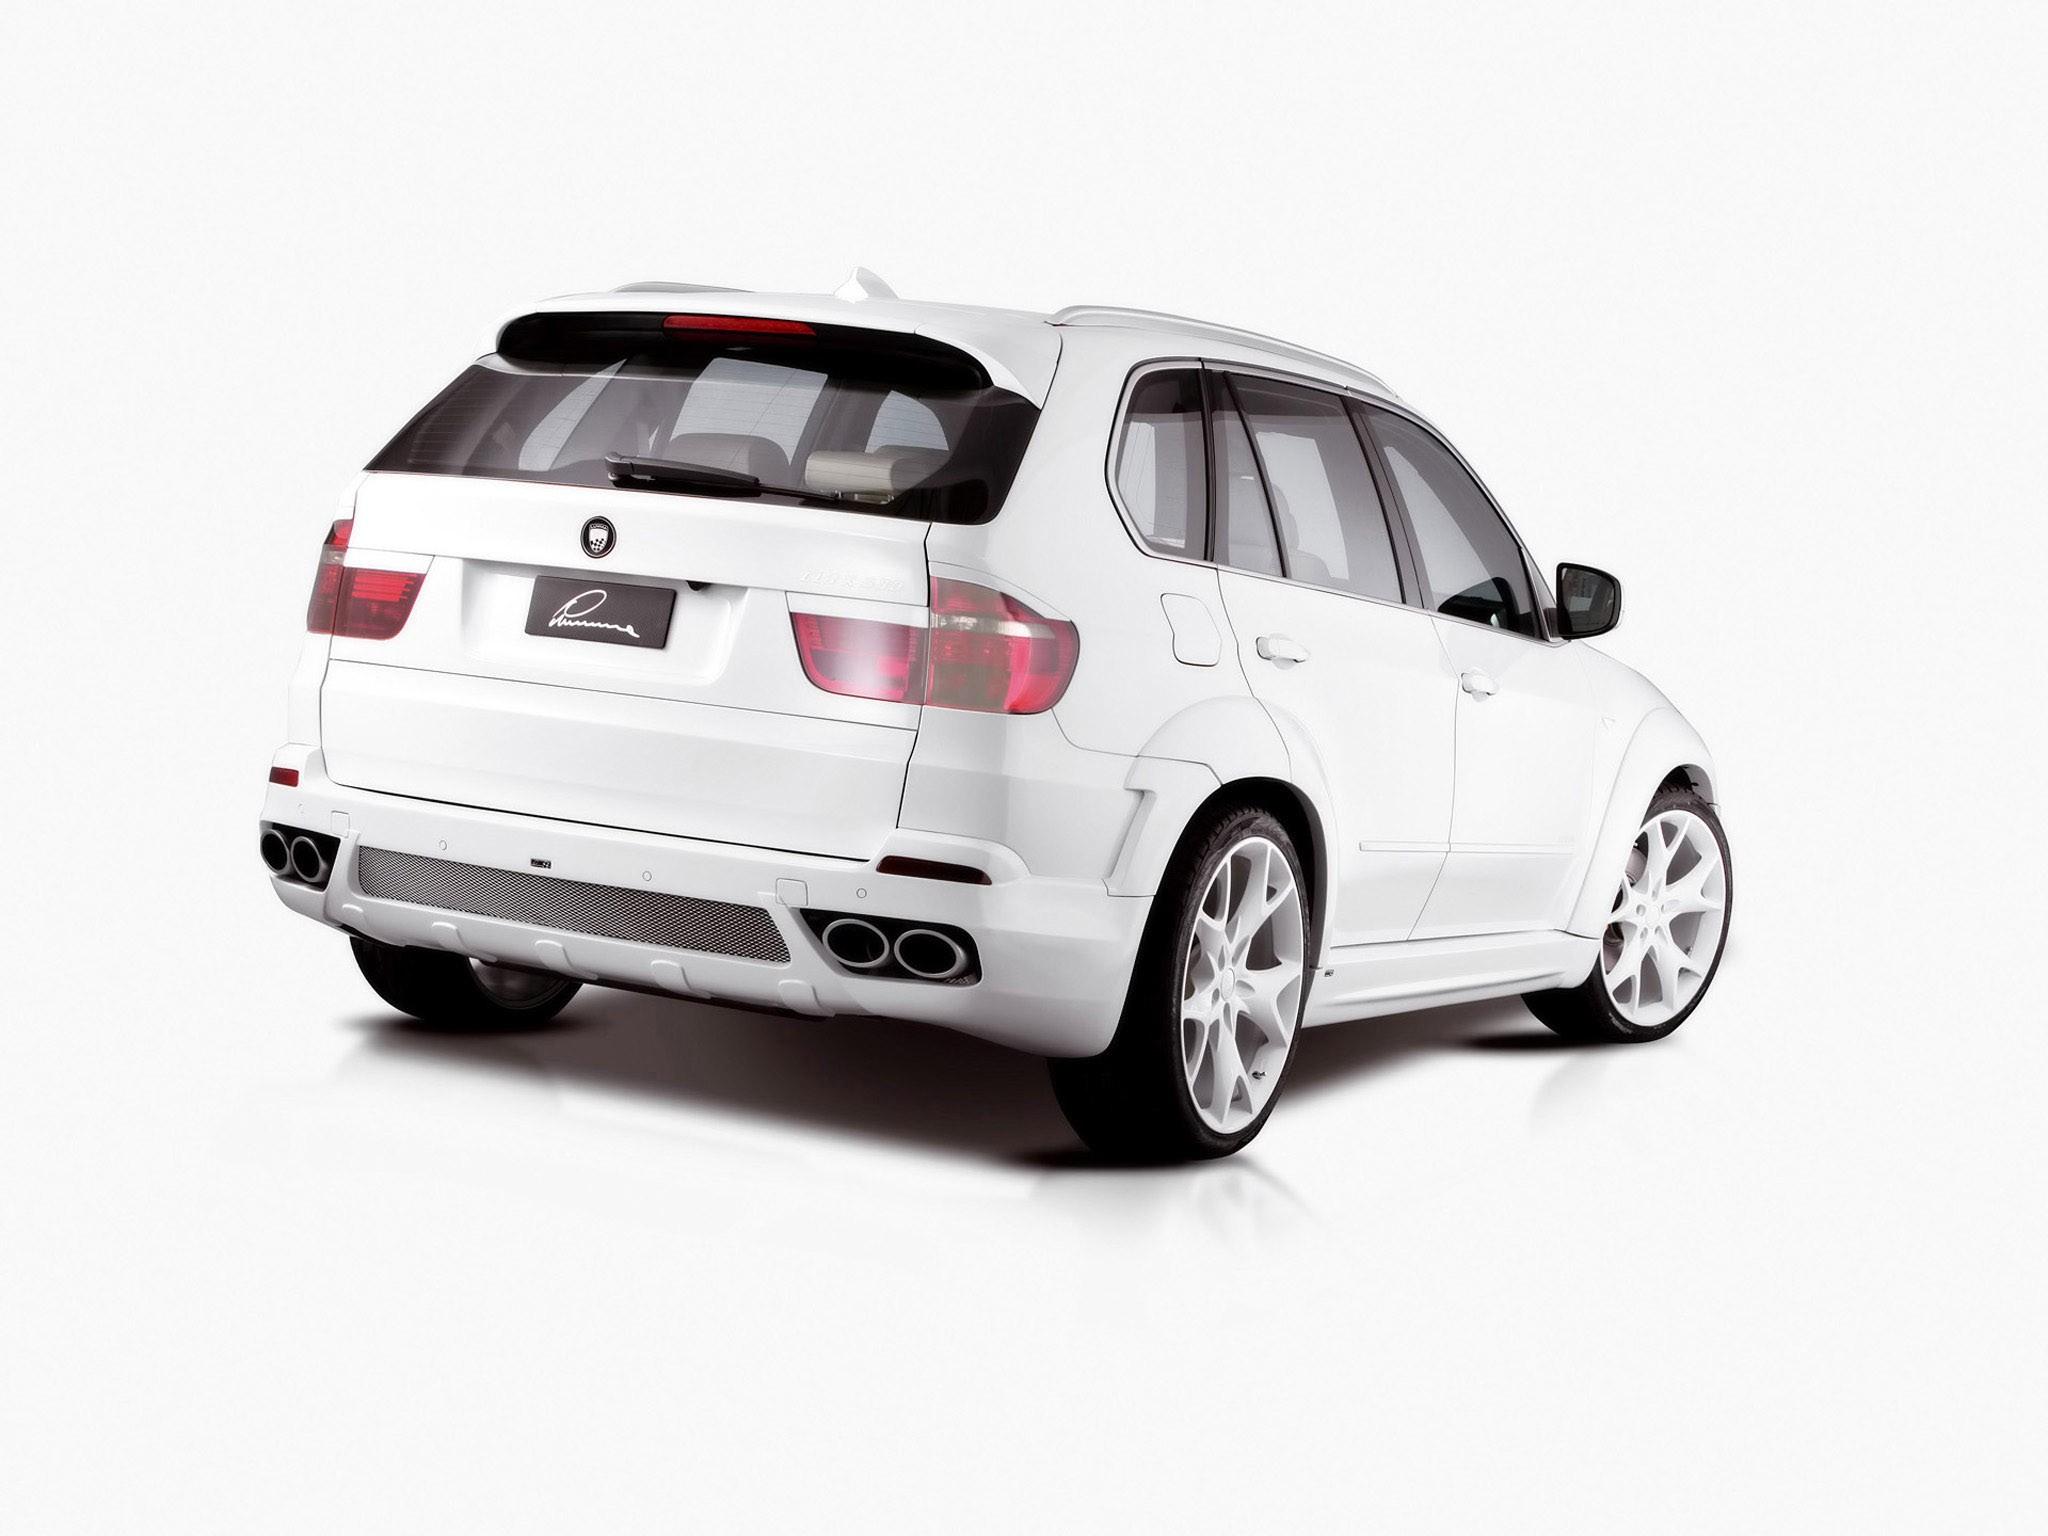 2008 Lumma Design - Bmw X530 Diesel E70